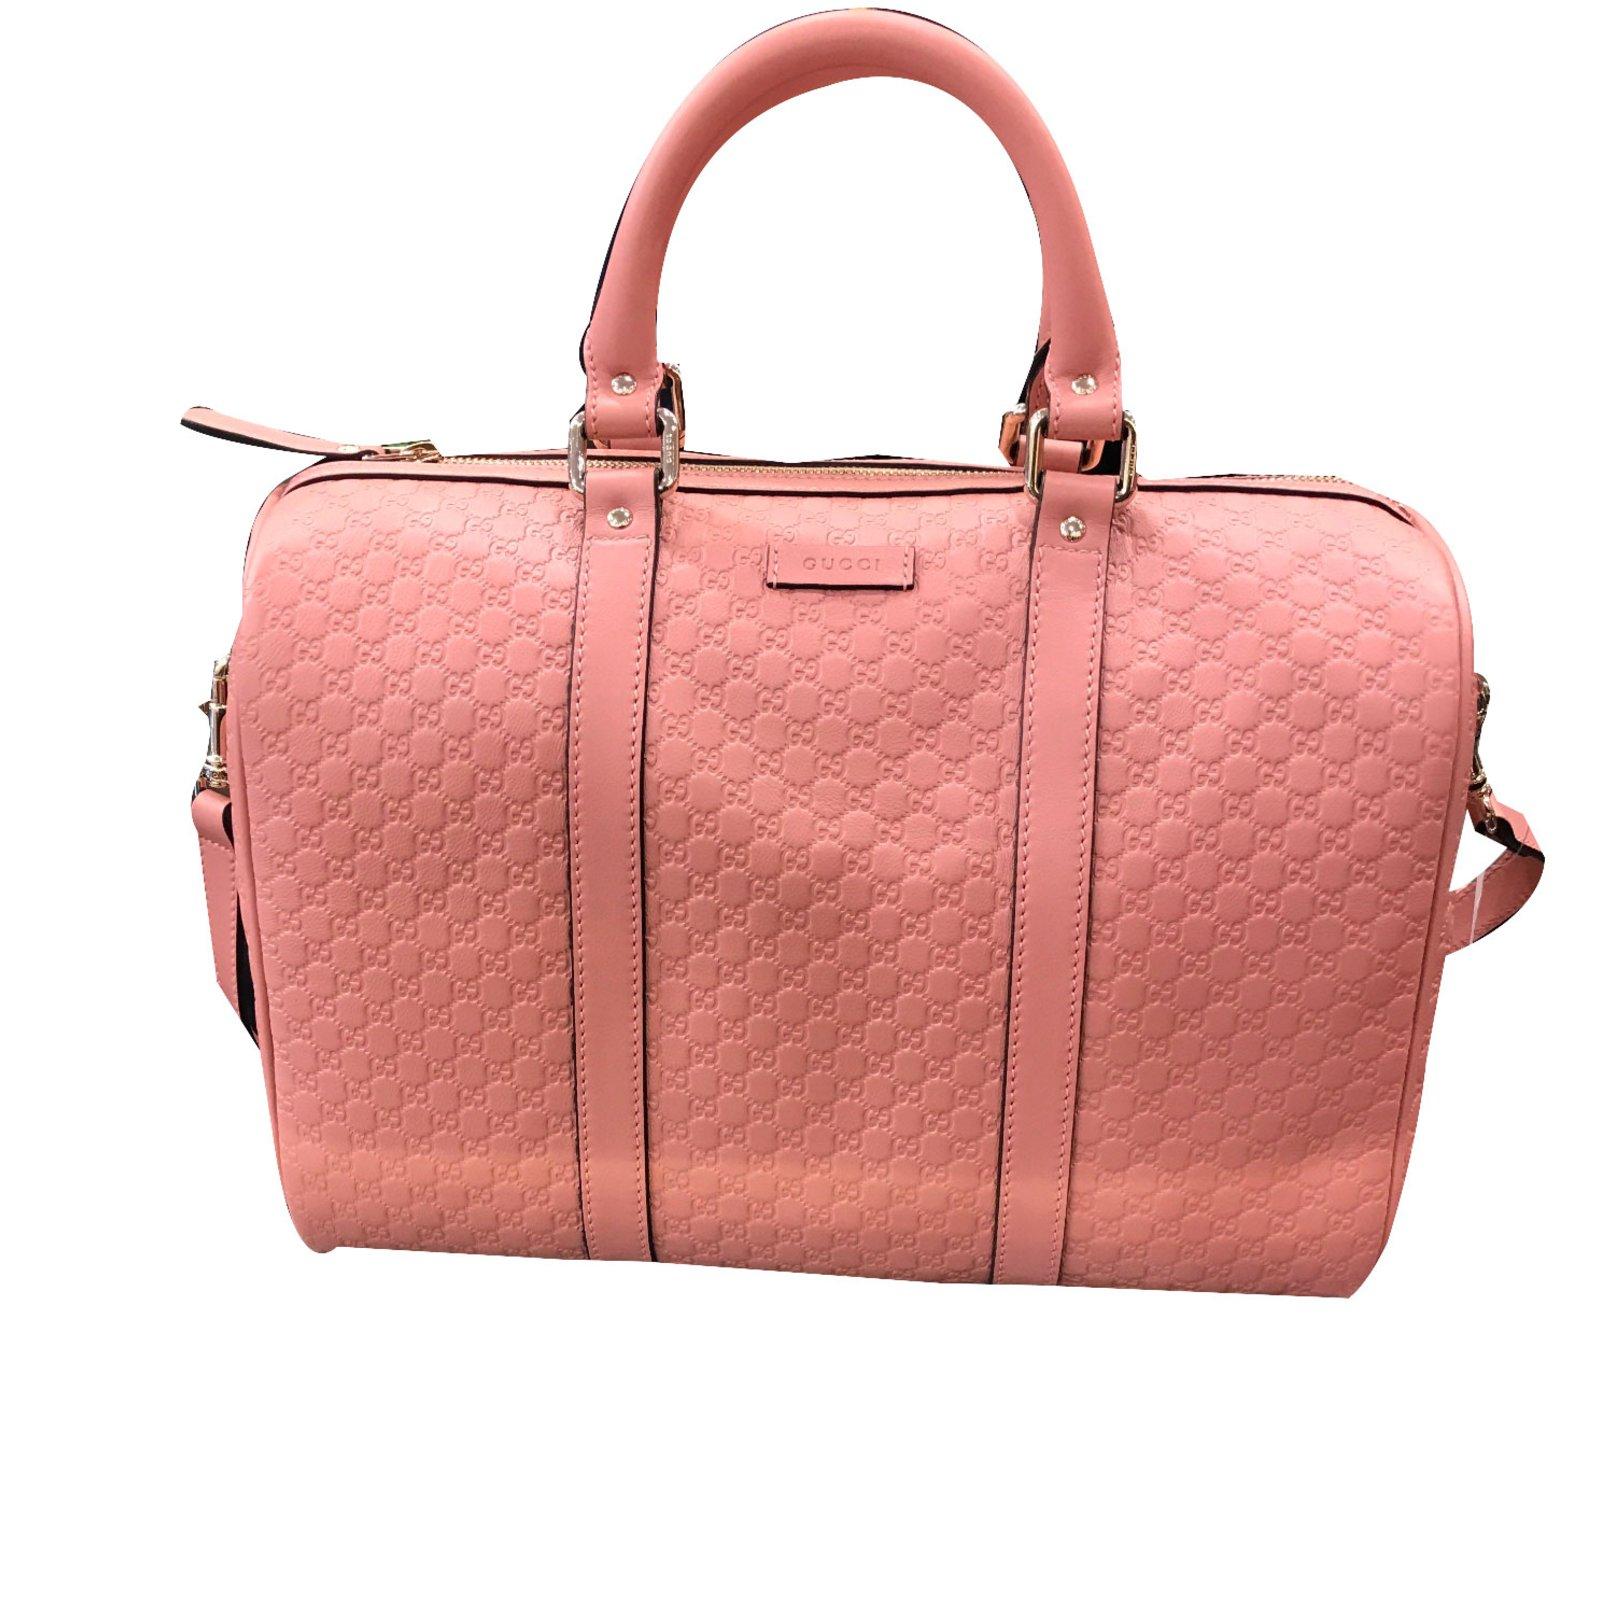 6207986aa Gucci Handbag Handbags Leather Pink ref.46214 - Joli Closet